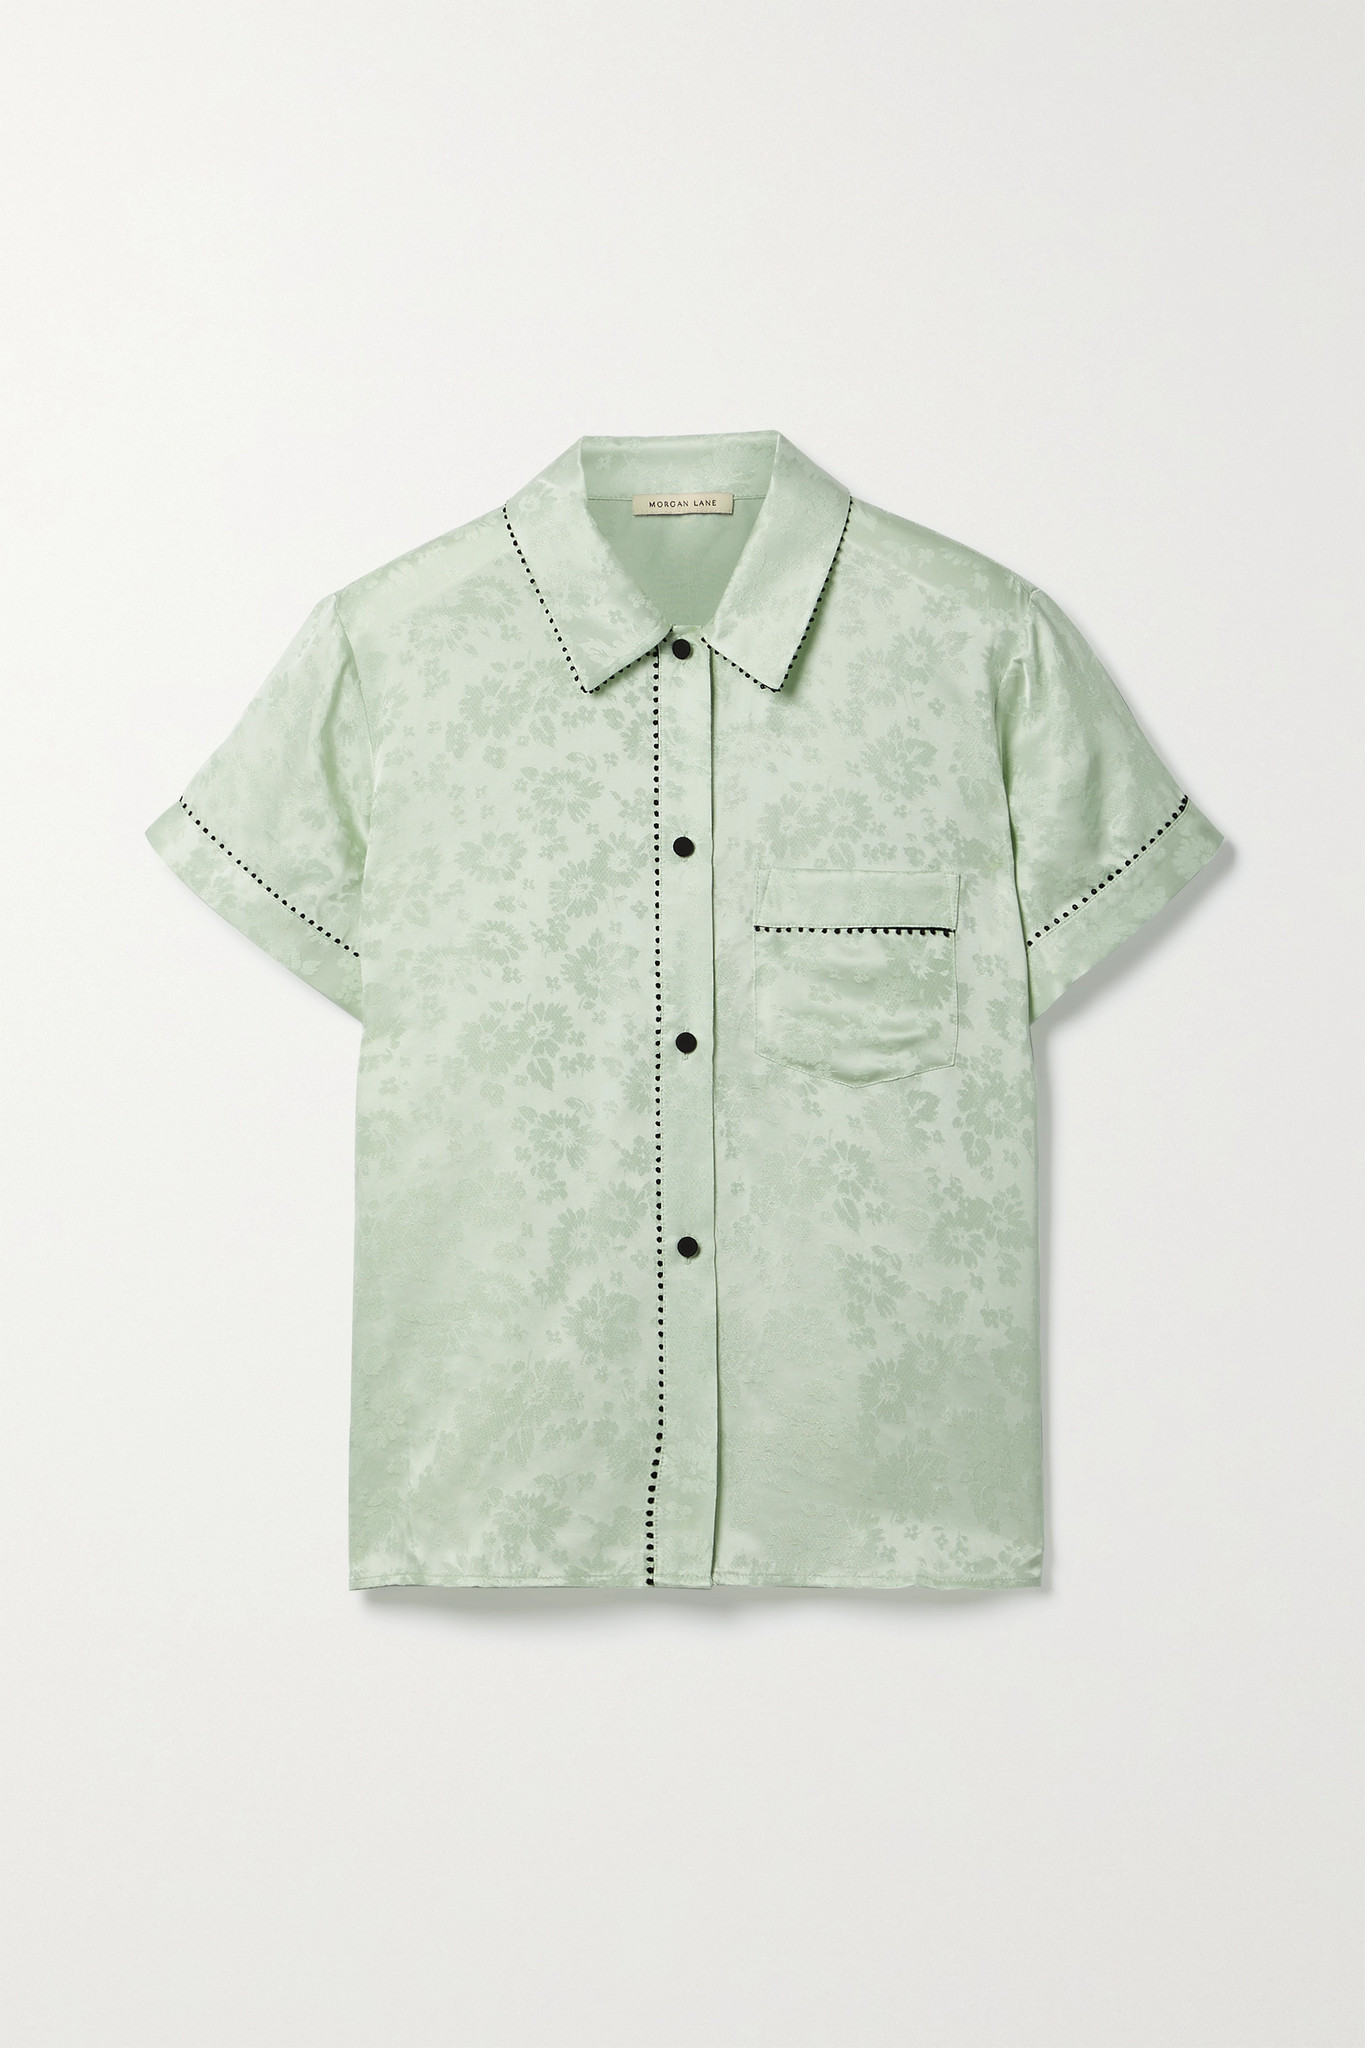 MORGAN LANE - Tami Picot-trimmed Satin-jacquard Pajama Shirt - Green - medium